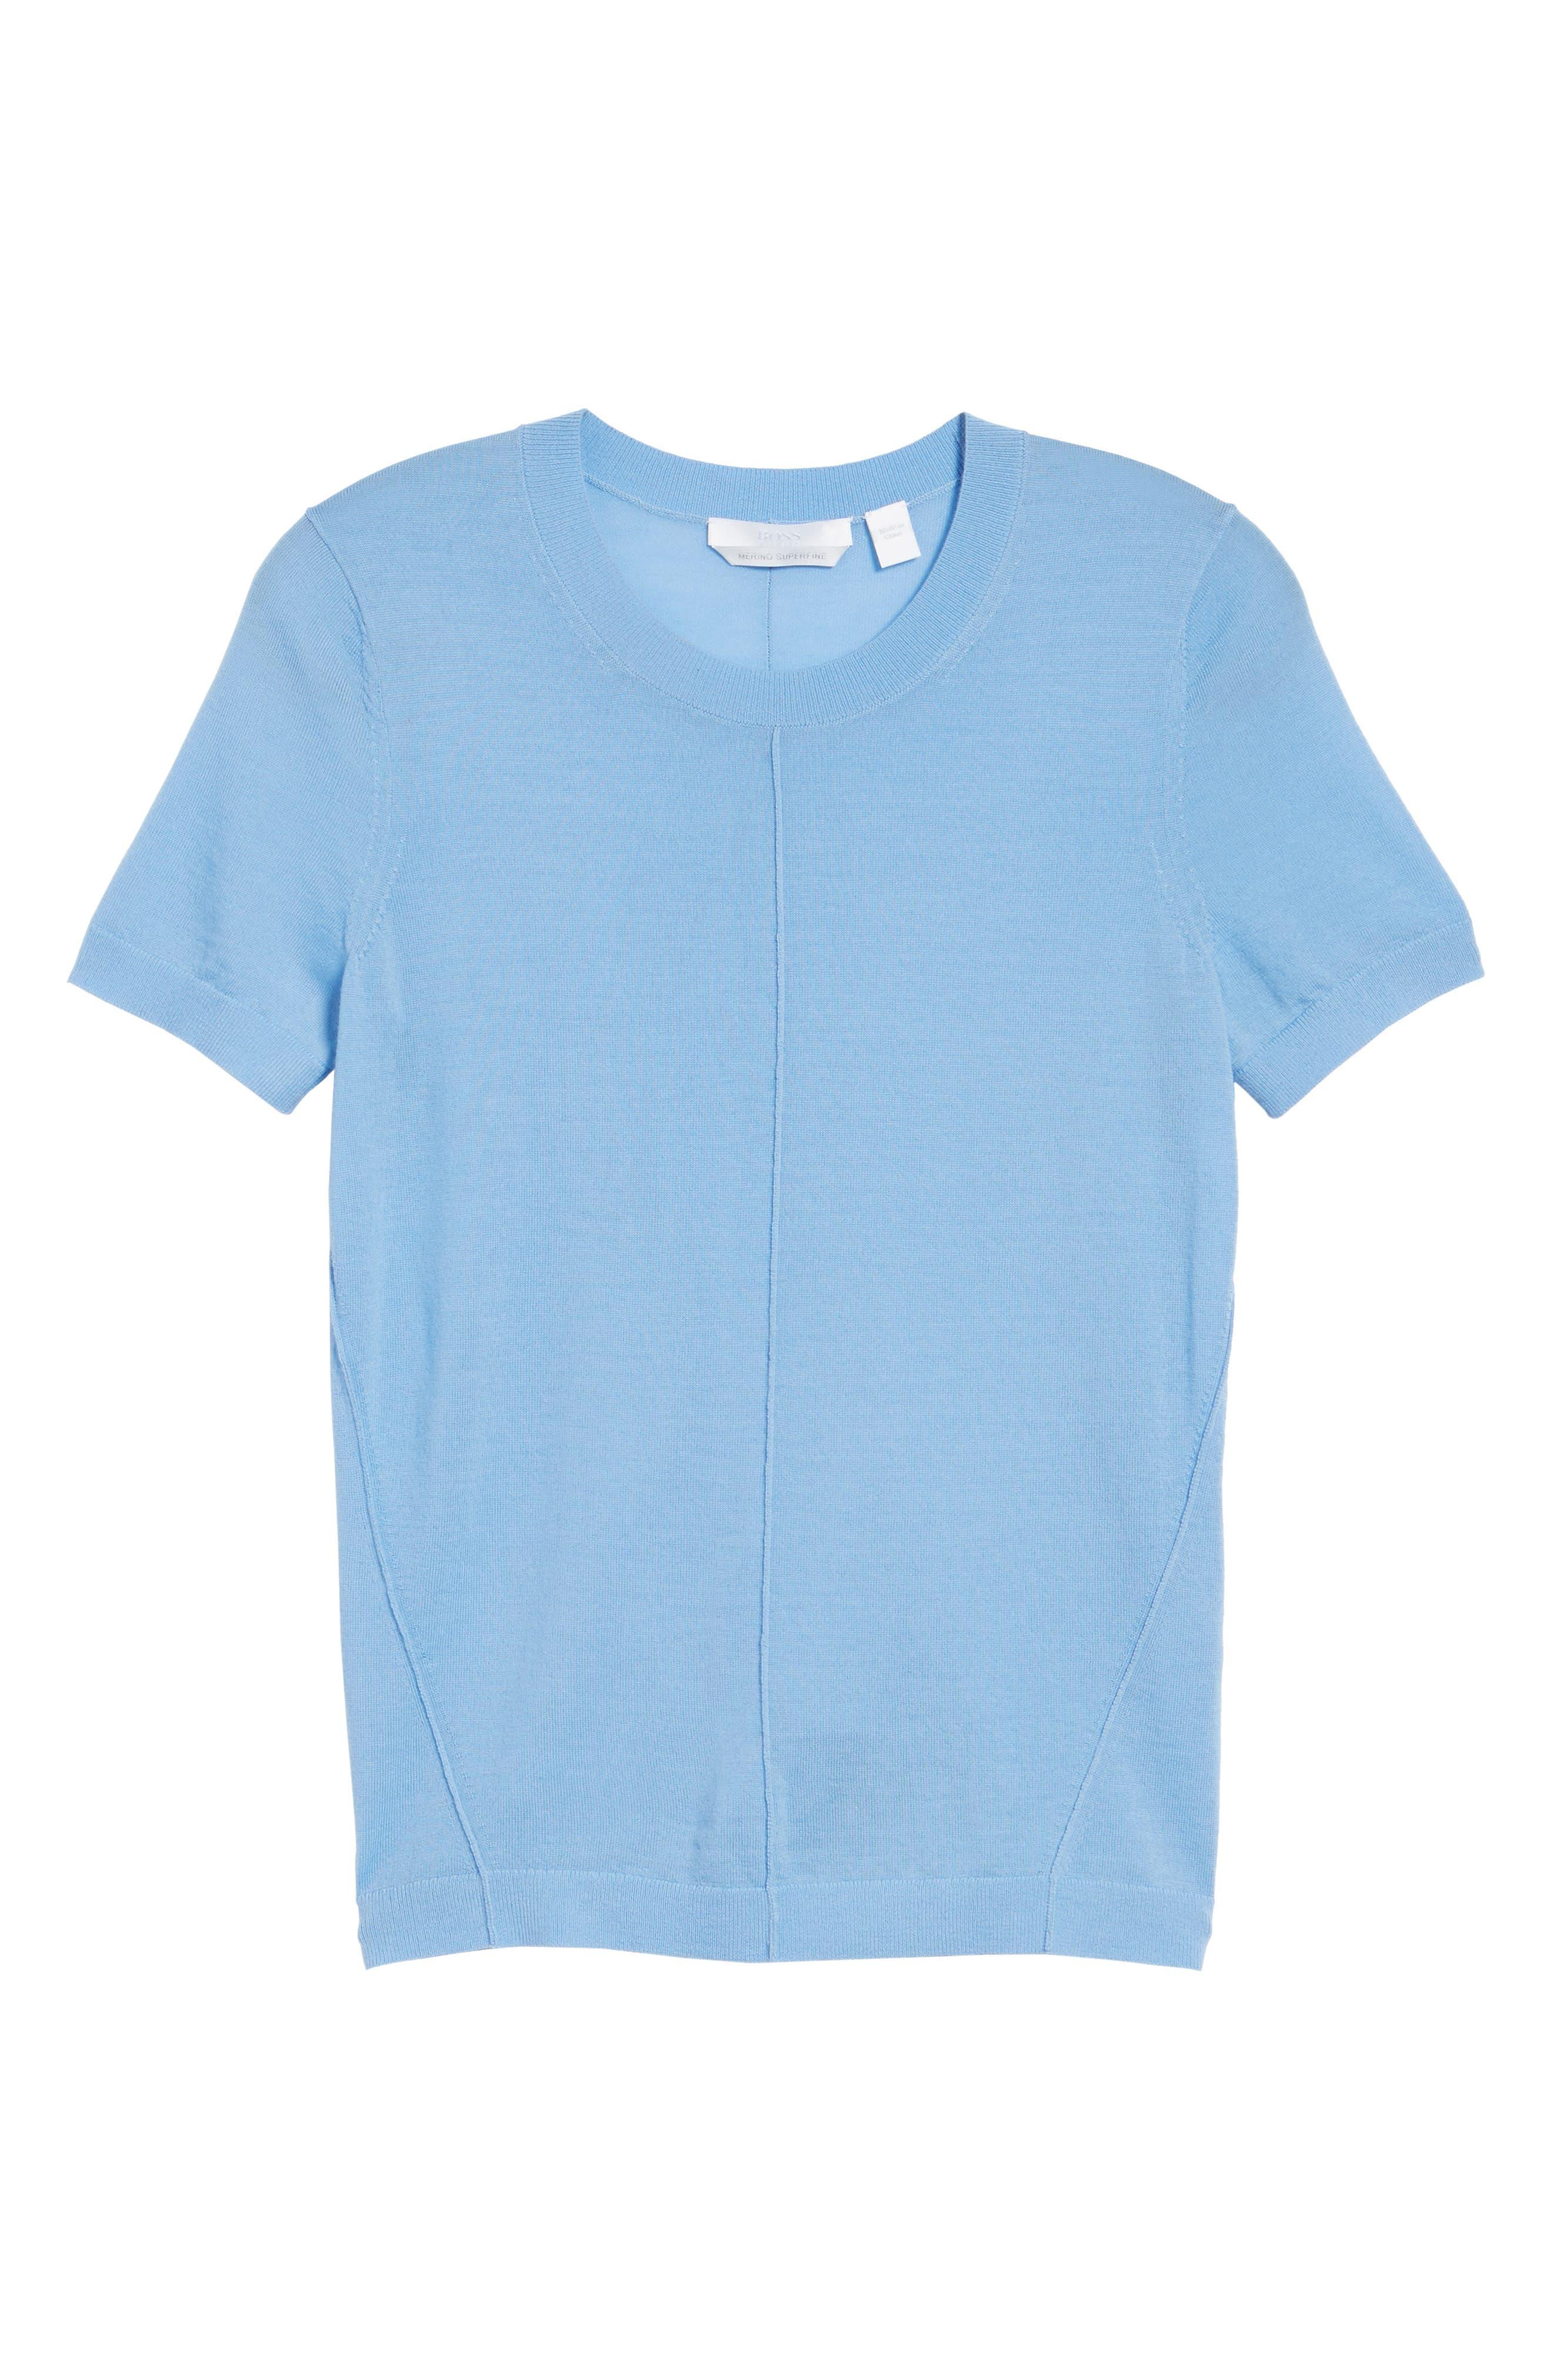 Fuyuka Wool Sweater,                             Alternate thumbnail 6, color,                             Blue Sky